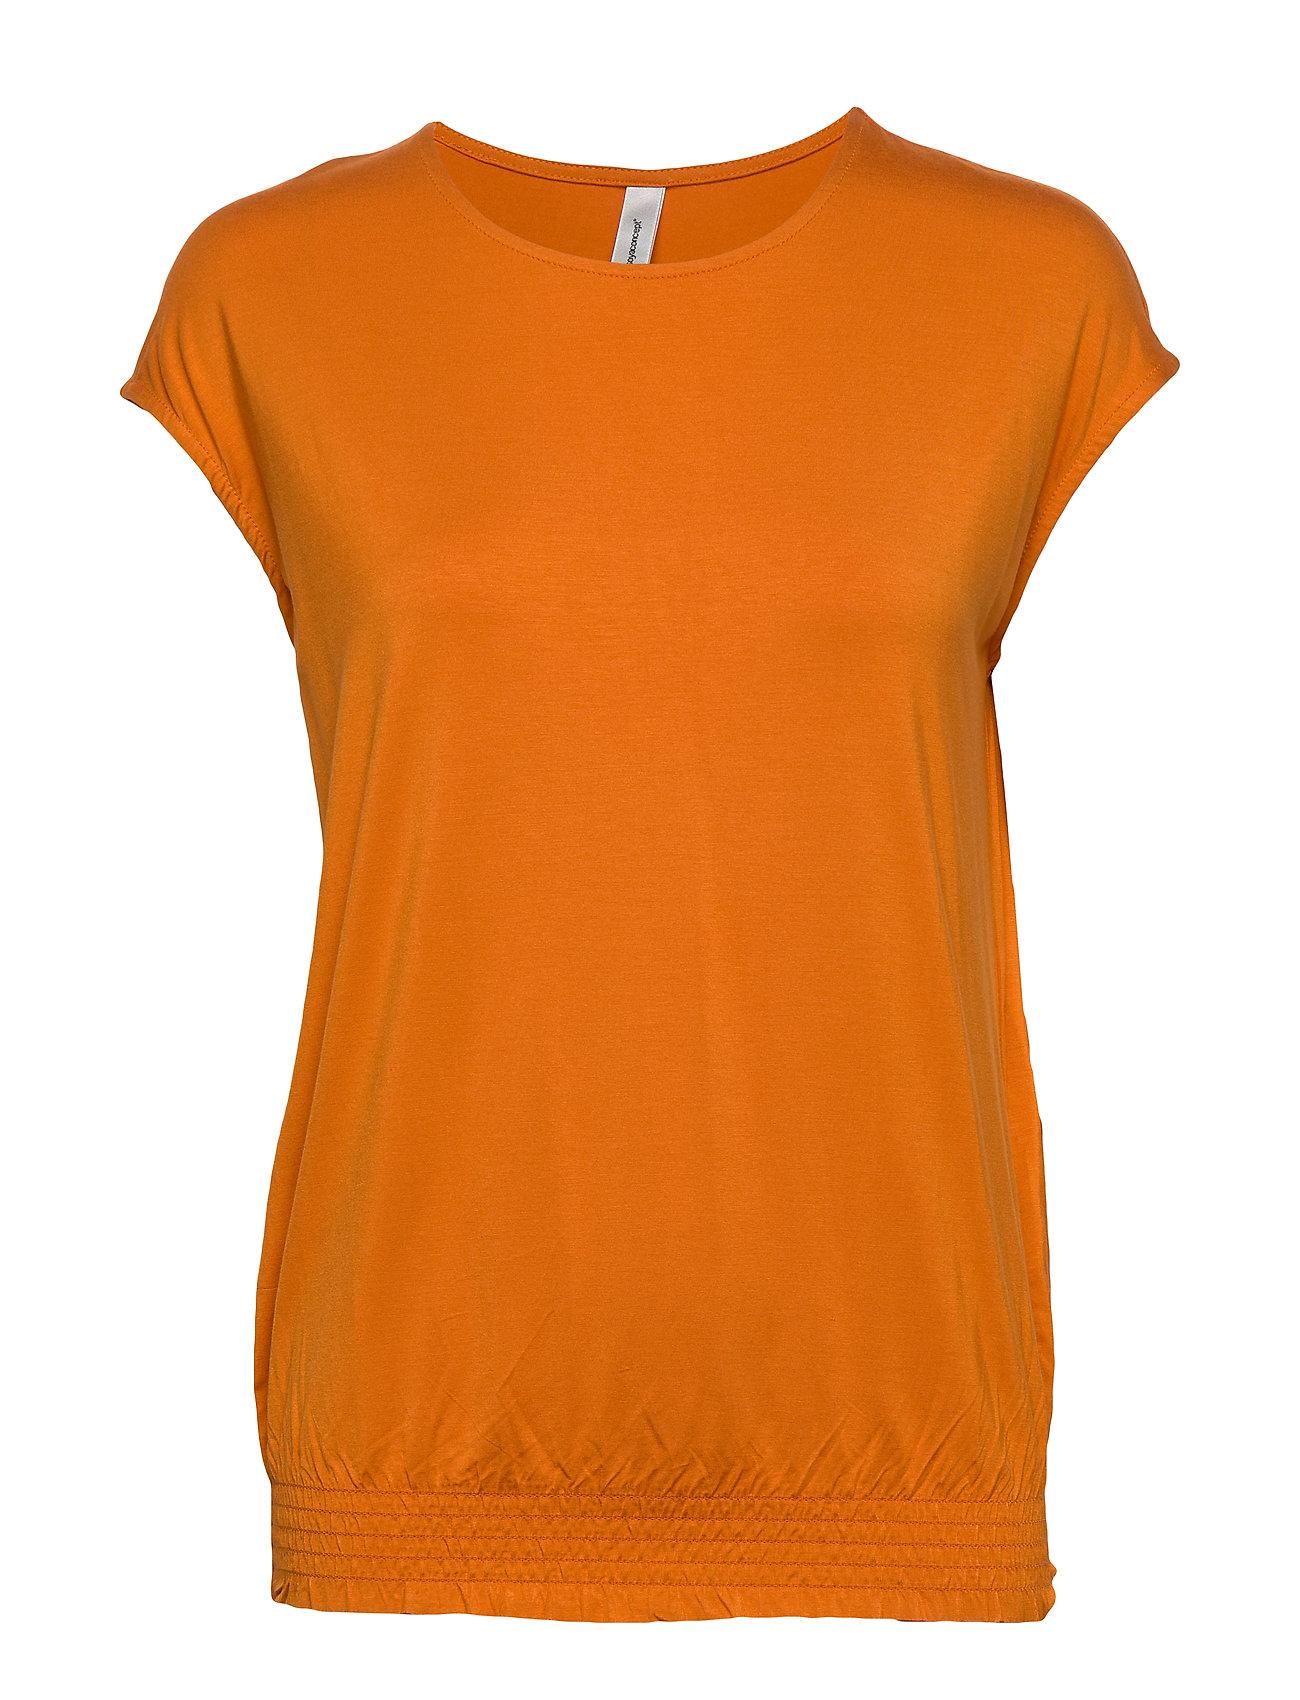 Image of Sc-Marica T-shirt Top Orange Soyaconcept (3363495159)